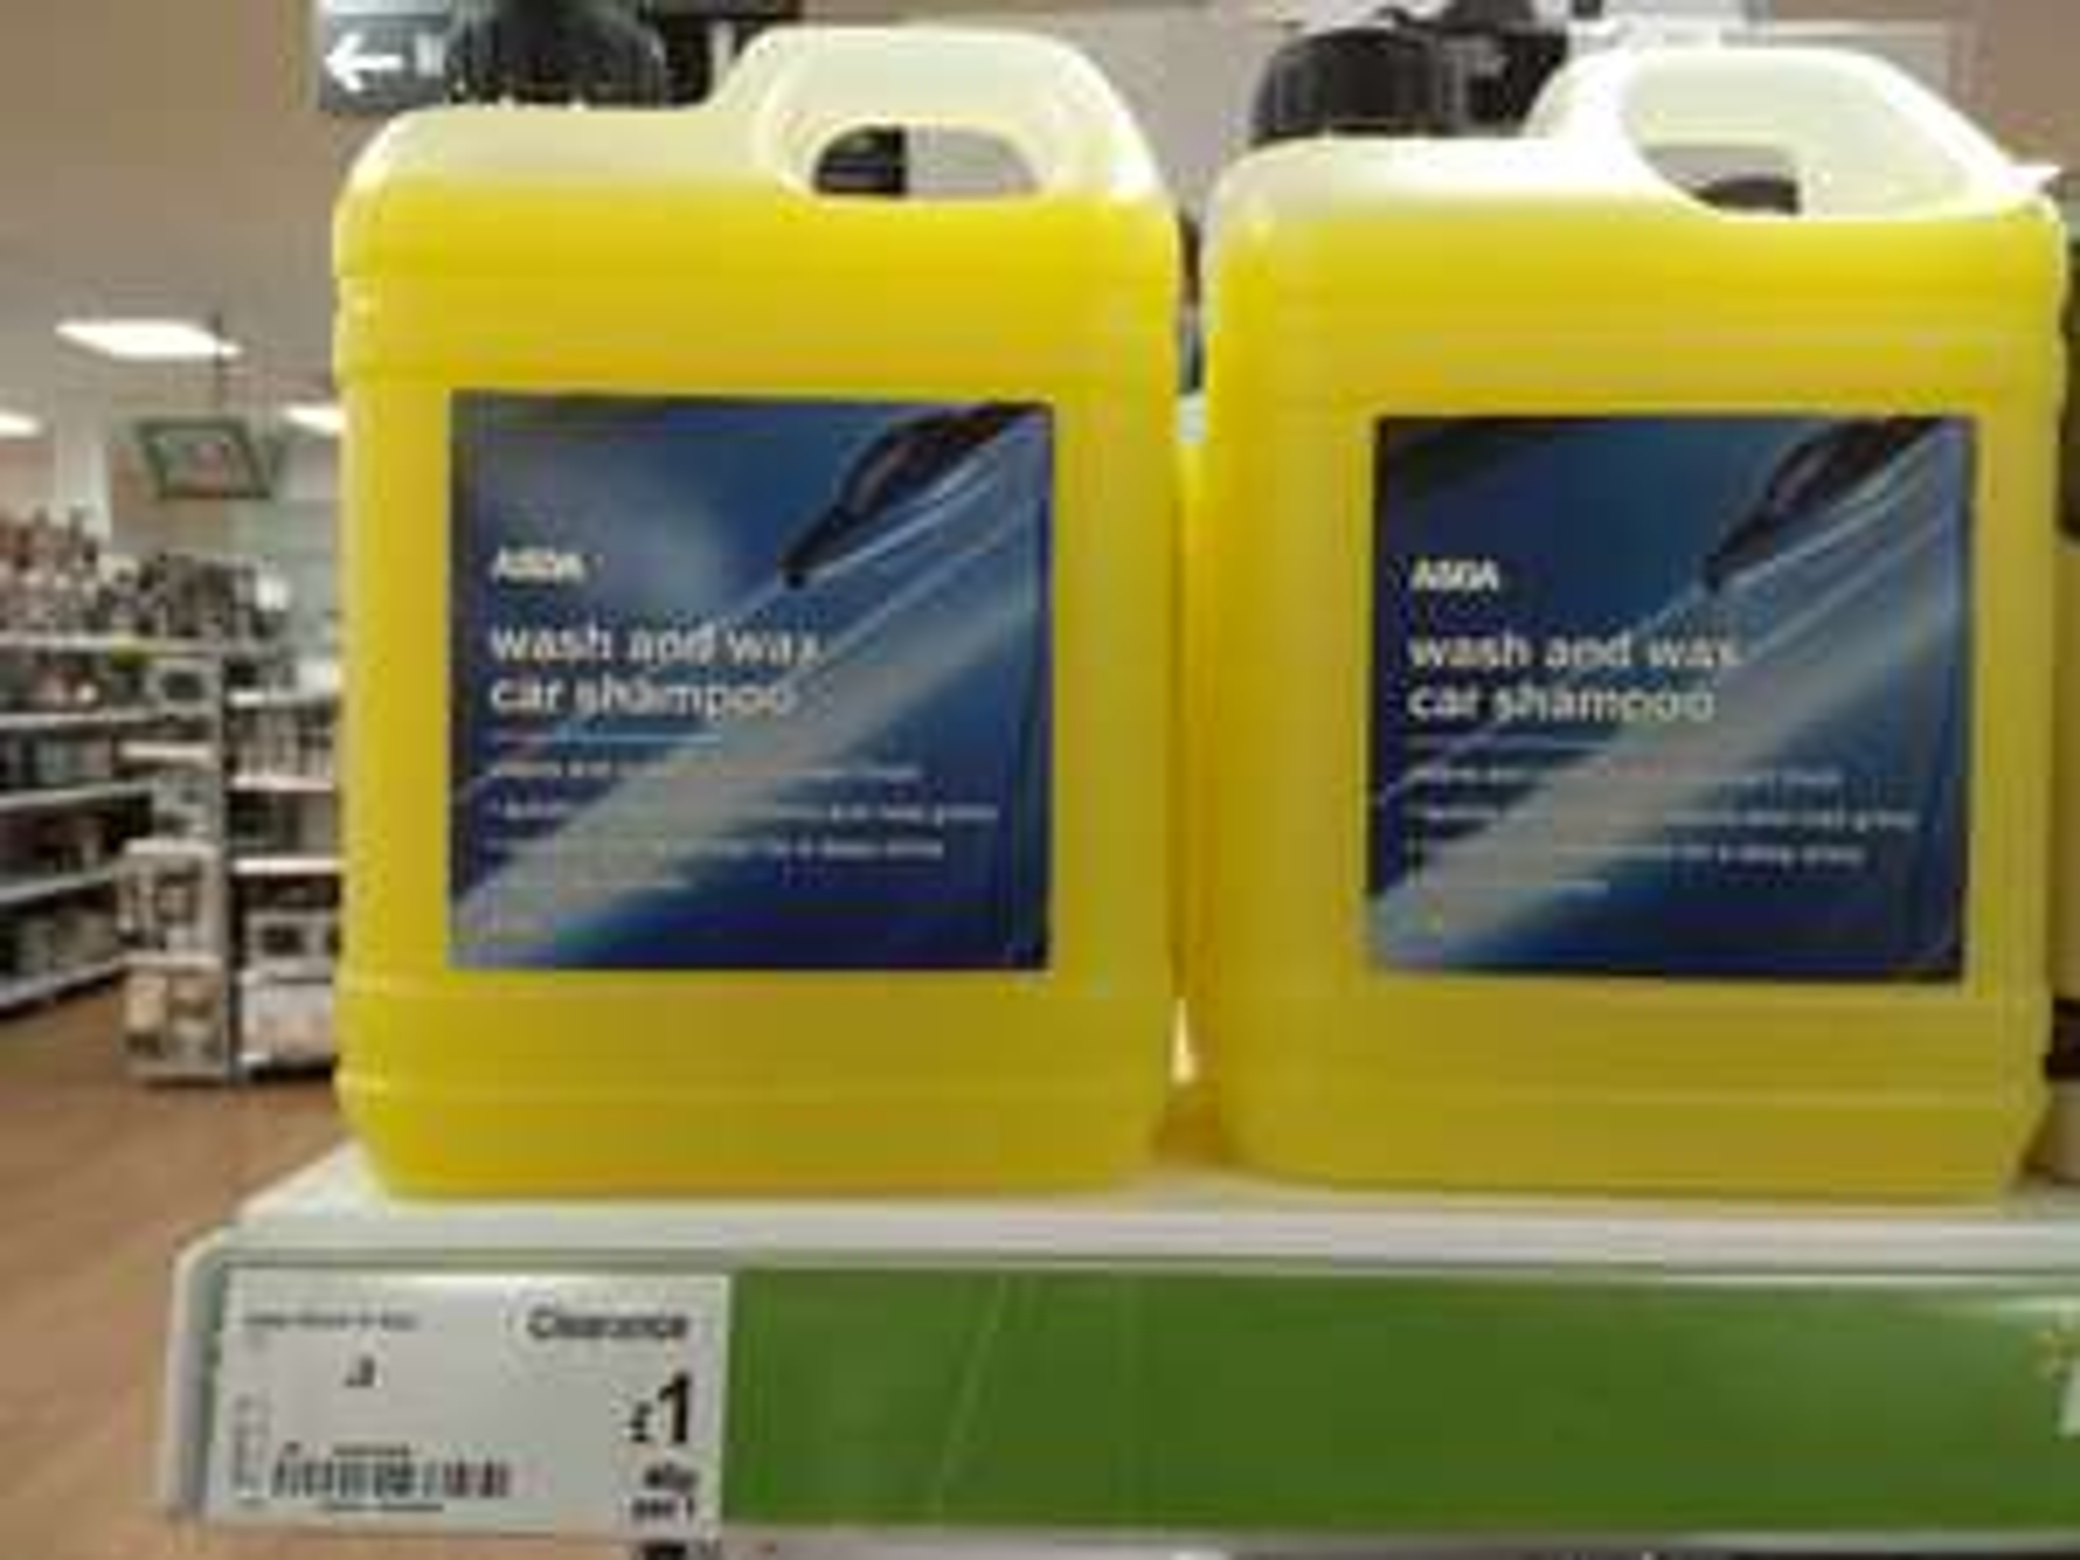 Asda wash and wax car shampoo 2.5 litre - £1 instore